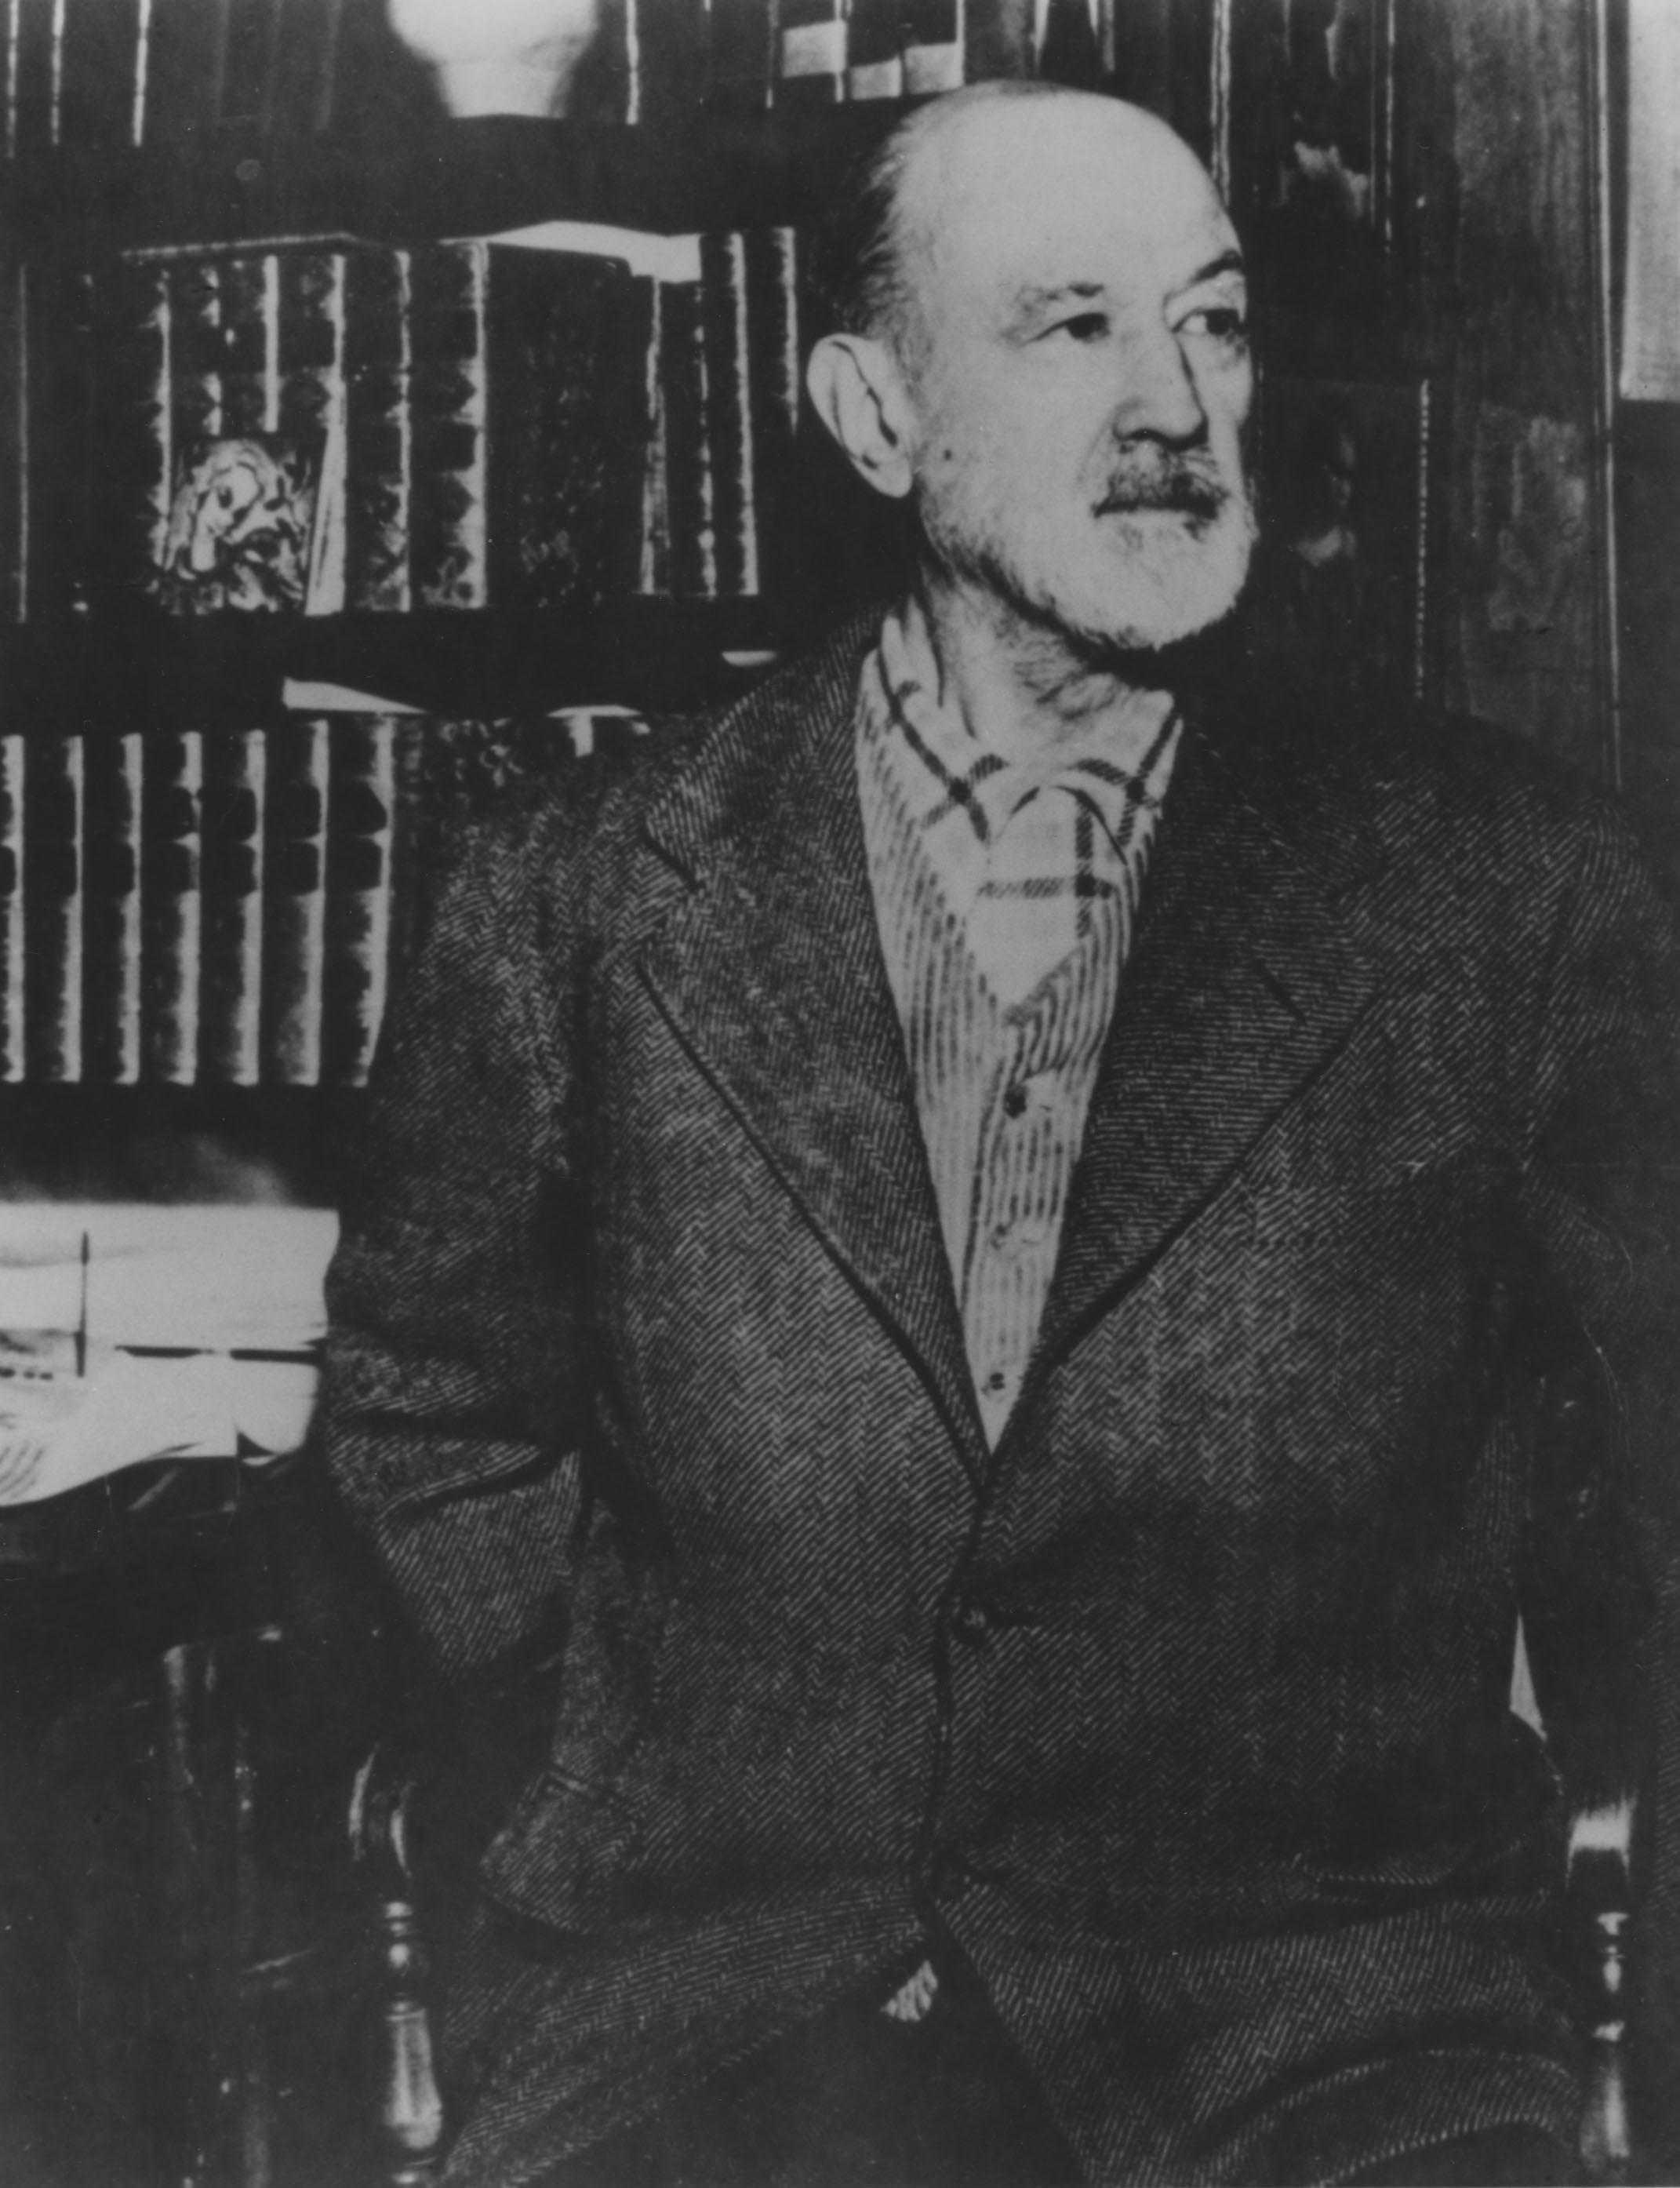 Frank Gerratana